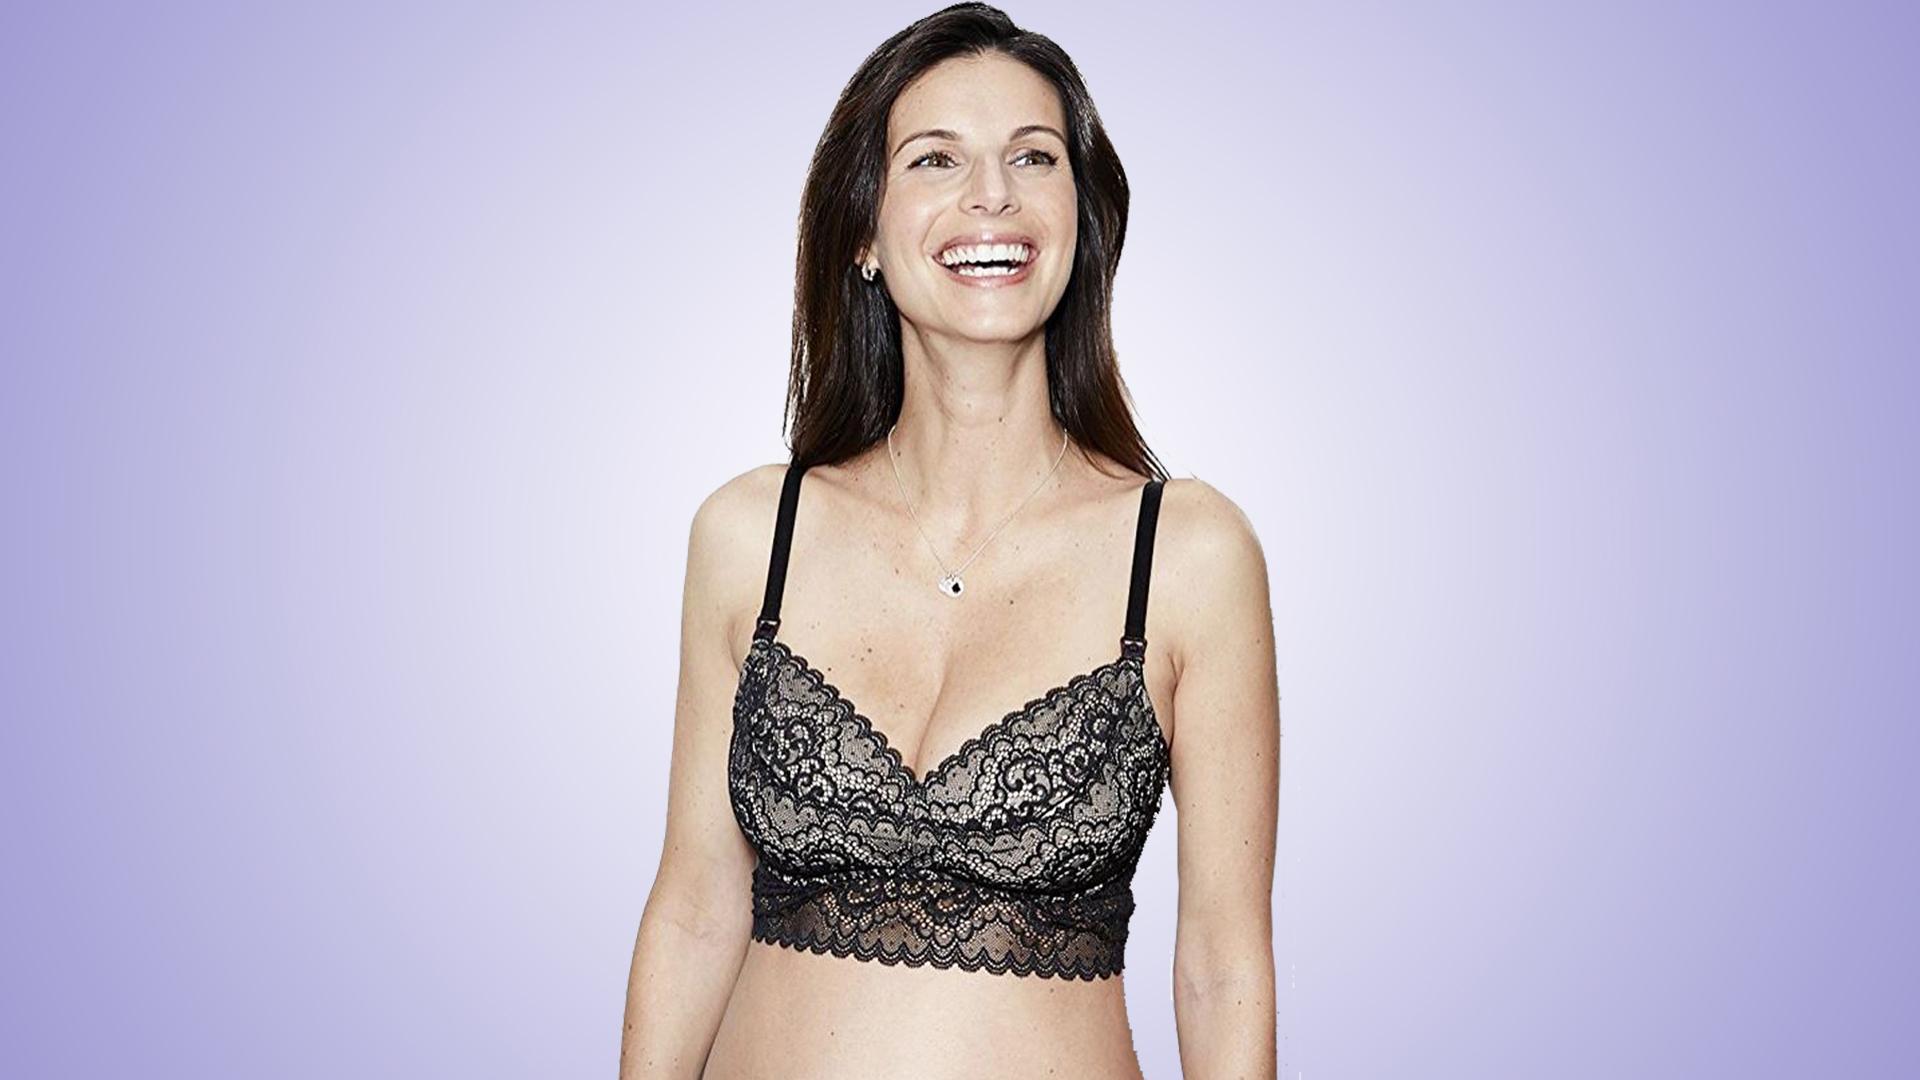 The best nursing bras for new moms on Amazon